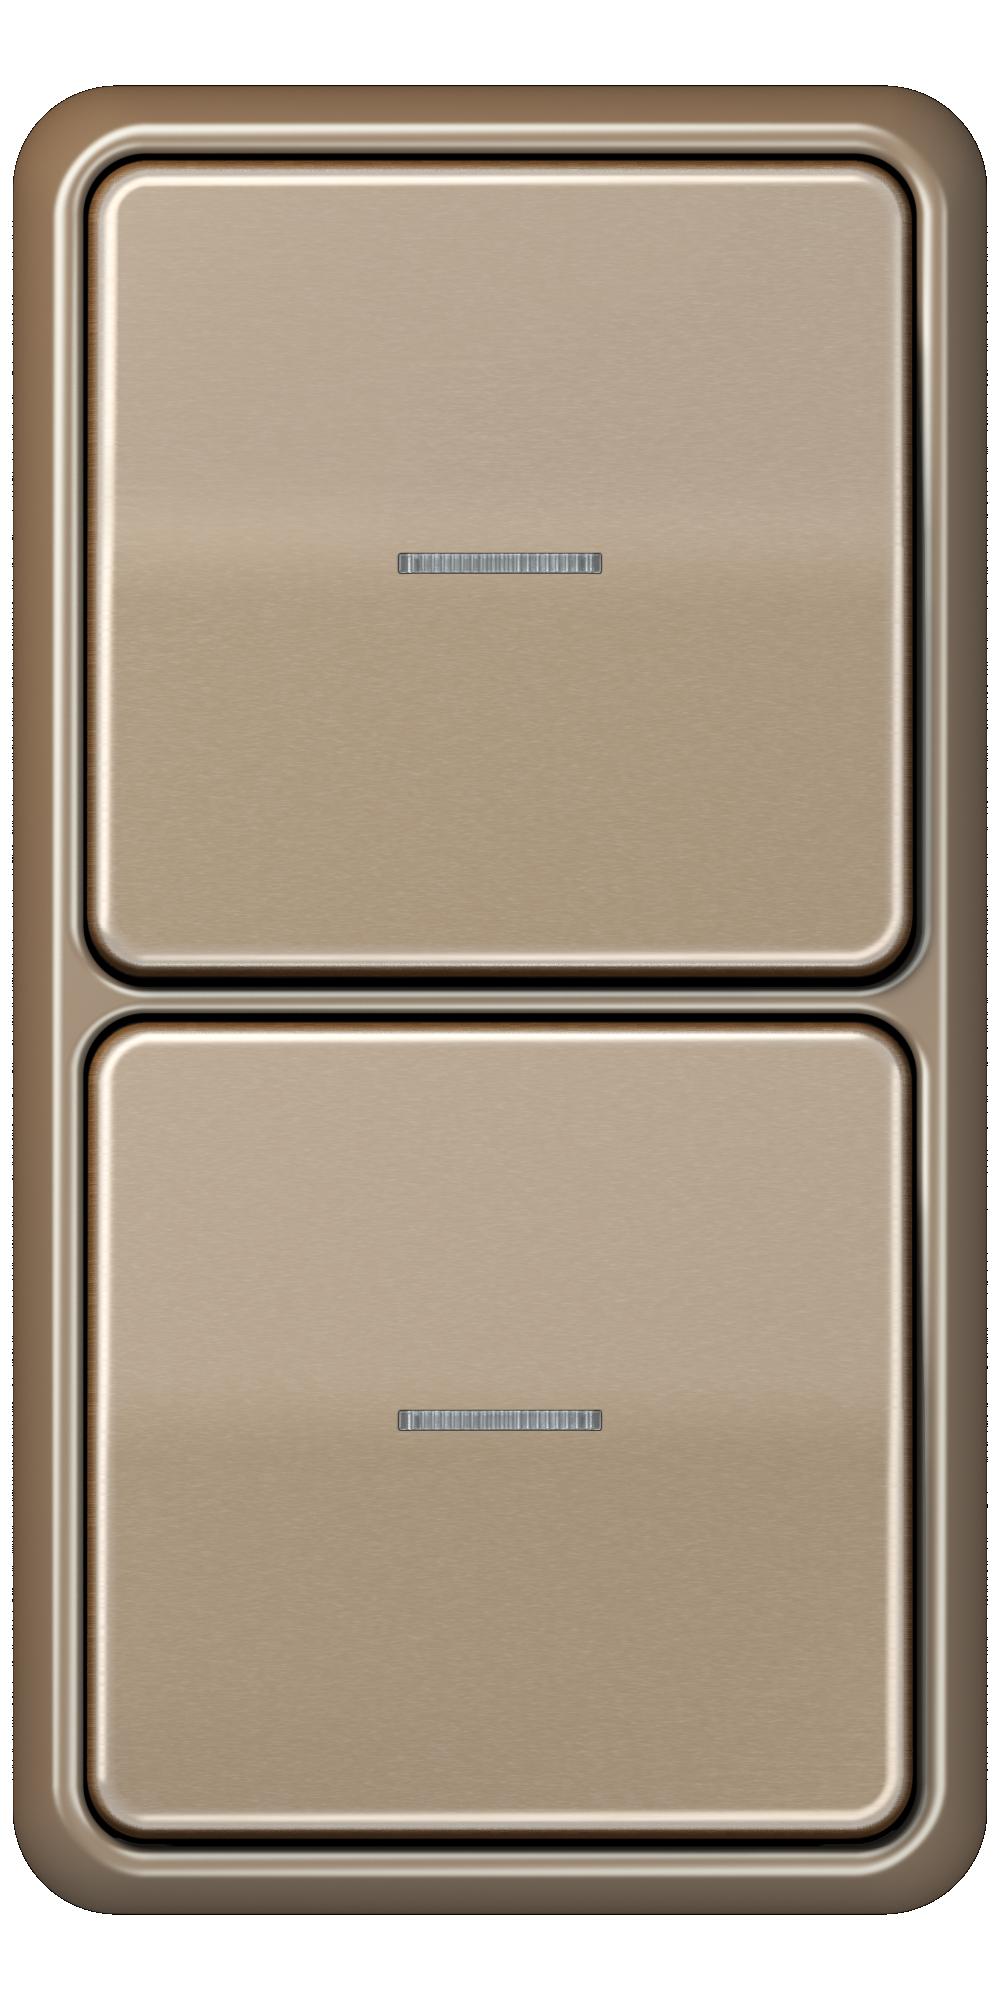 JUNG_CD500_gold-bronze_switch-lense_switch-lense